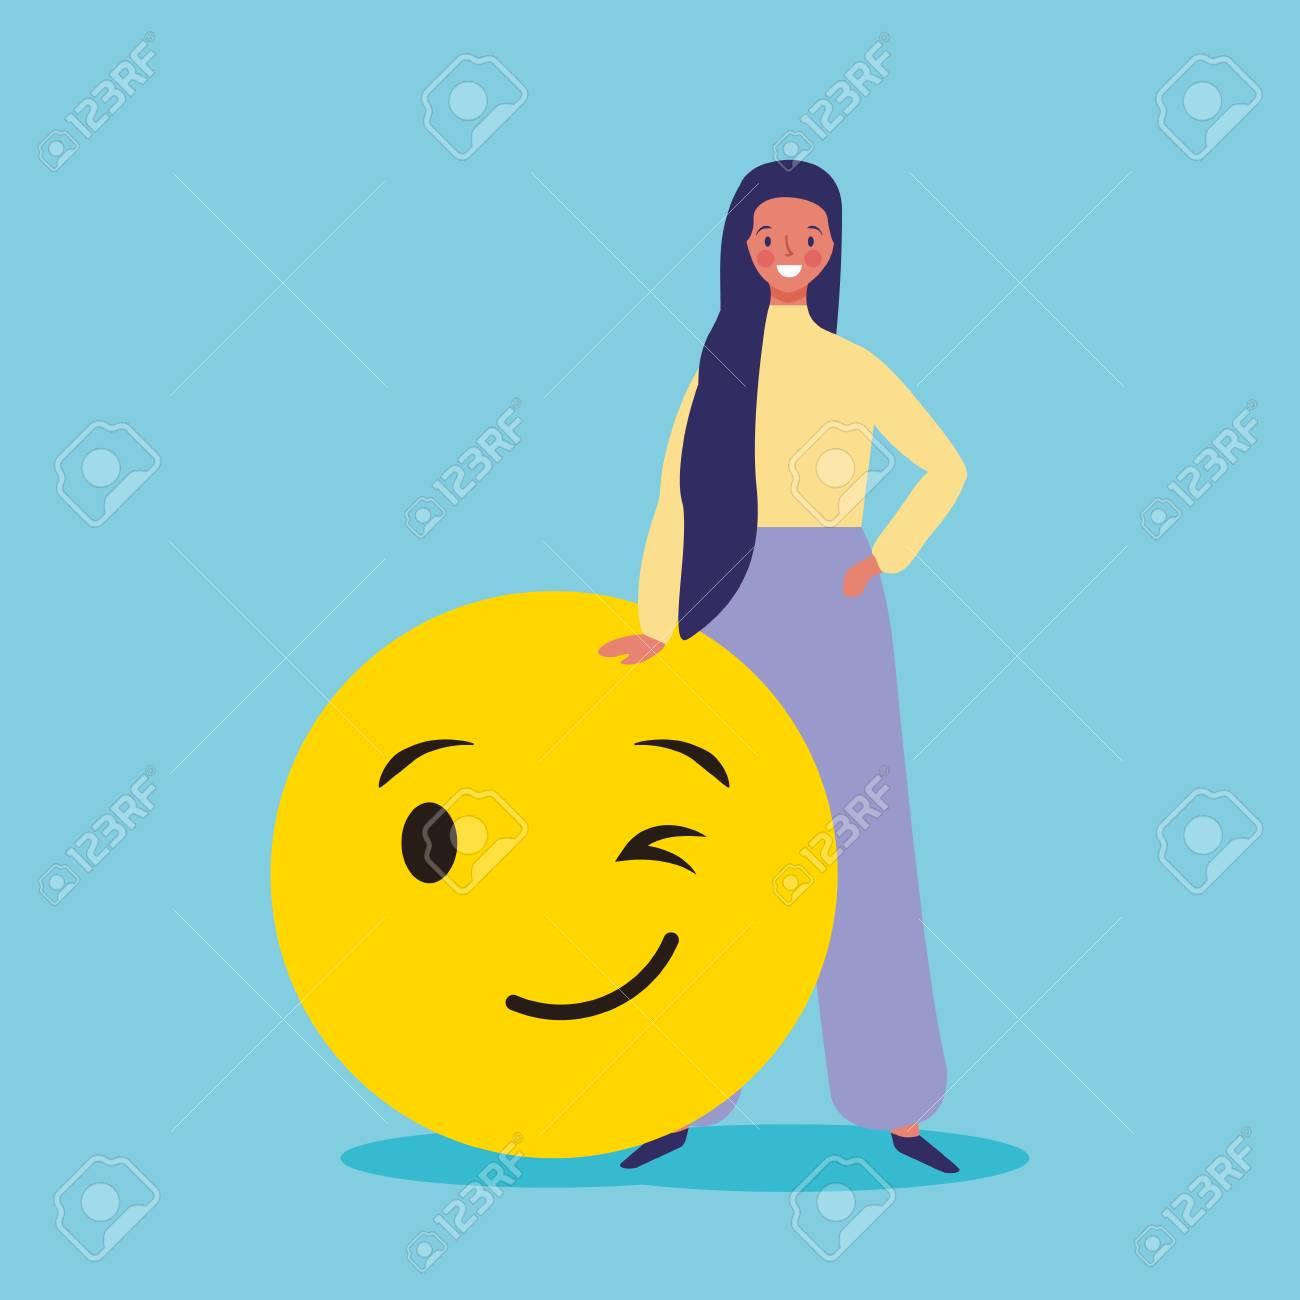 people and emojis woman